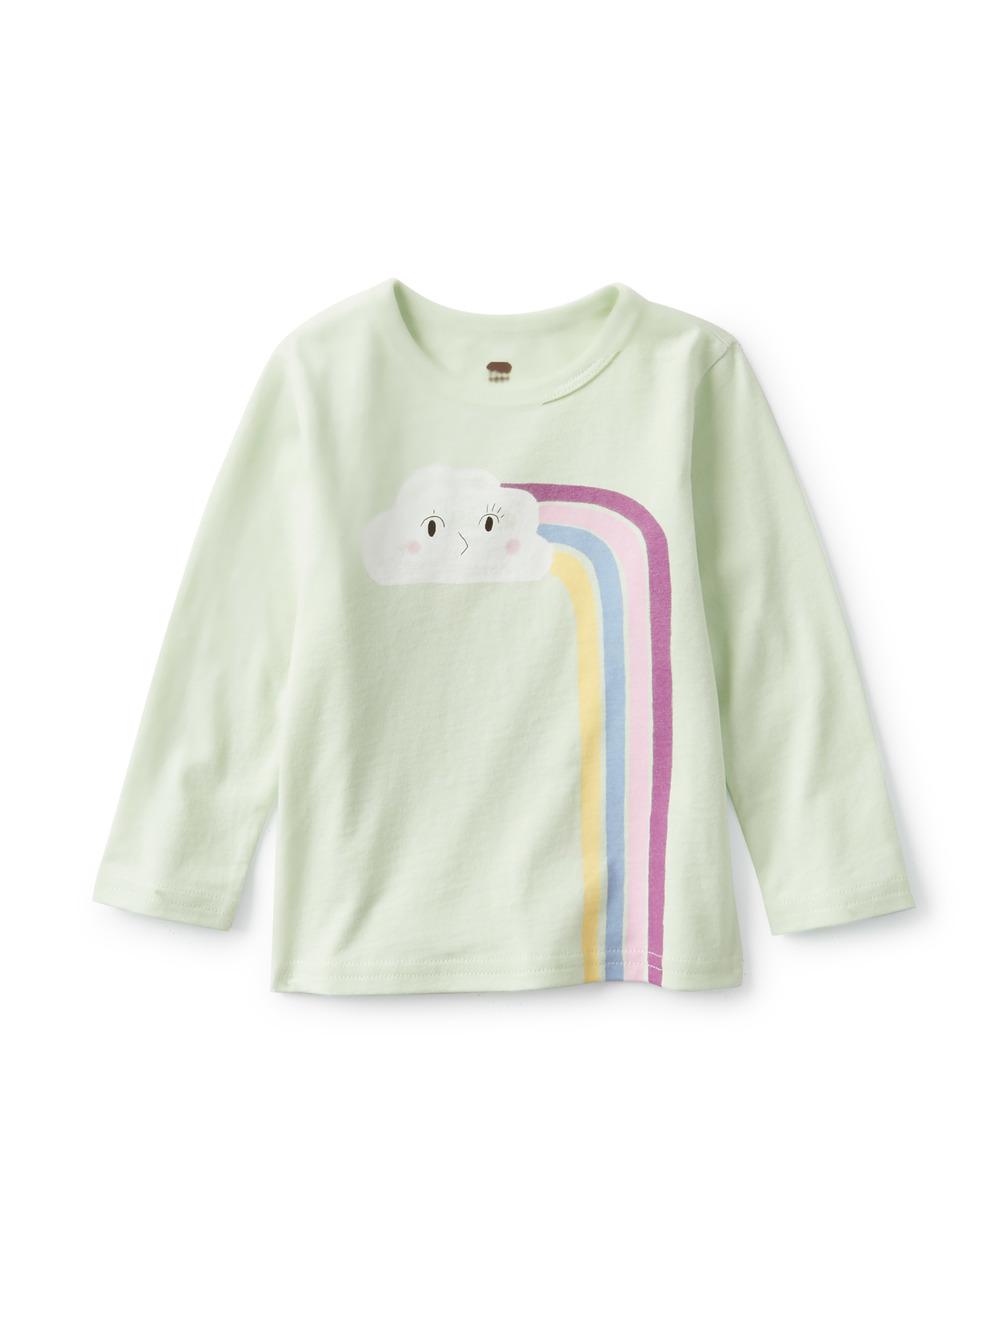 Rainbow Baby Graphic Tee